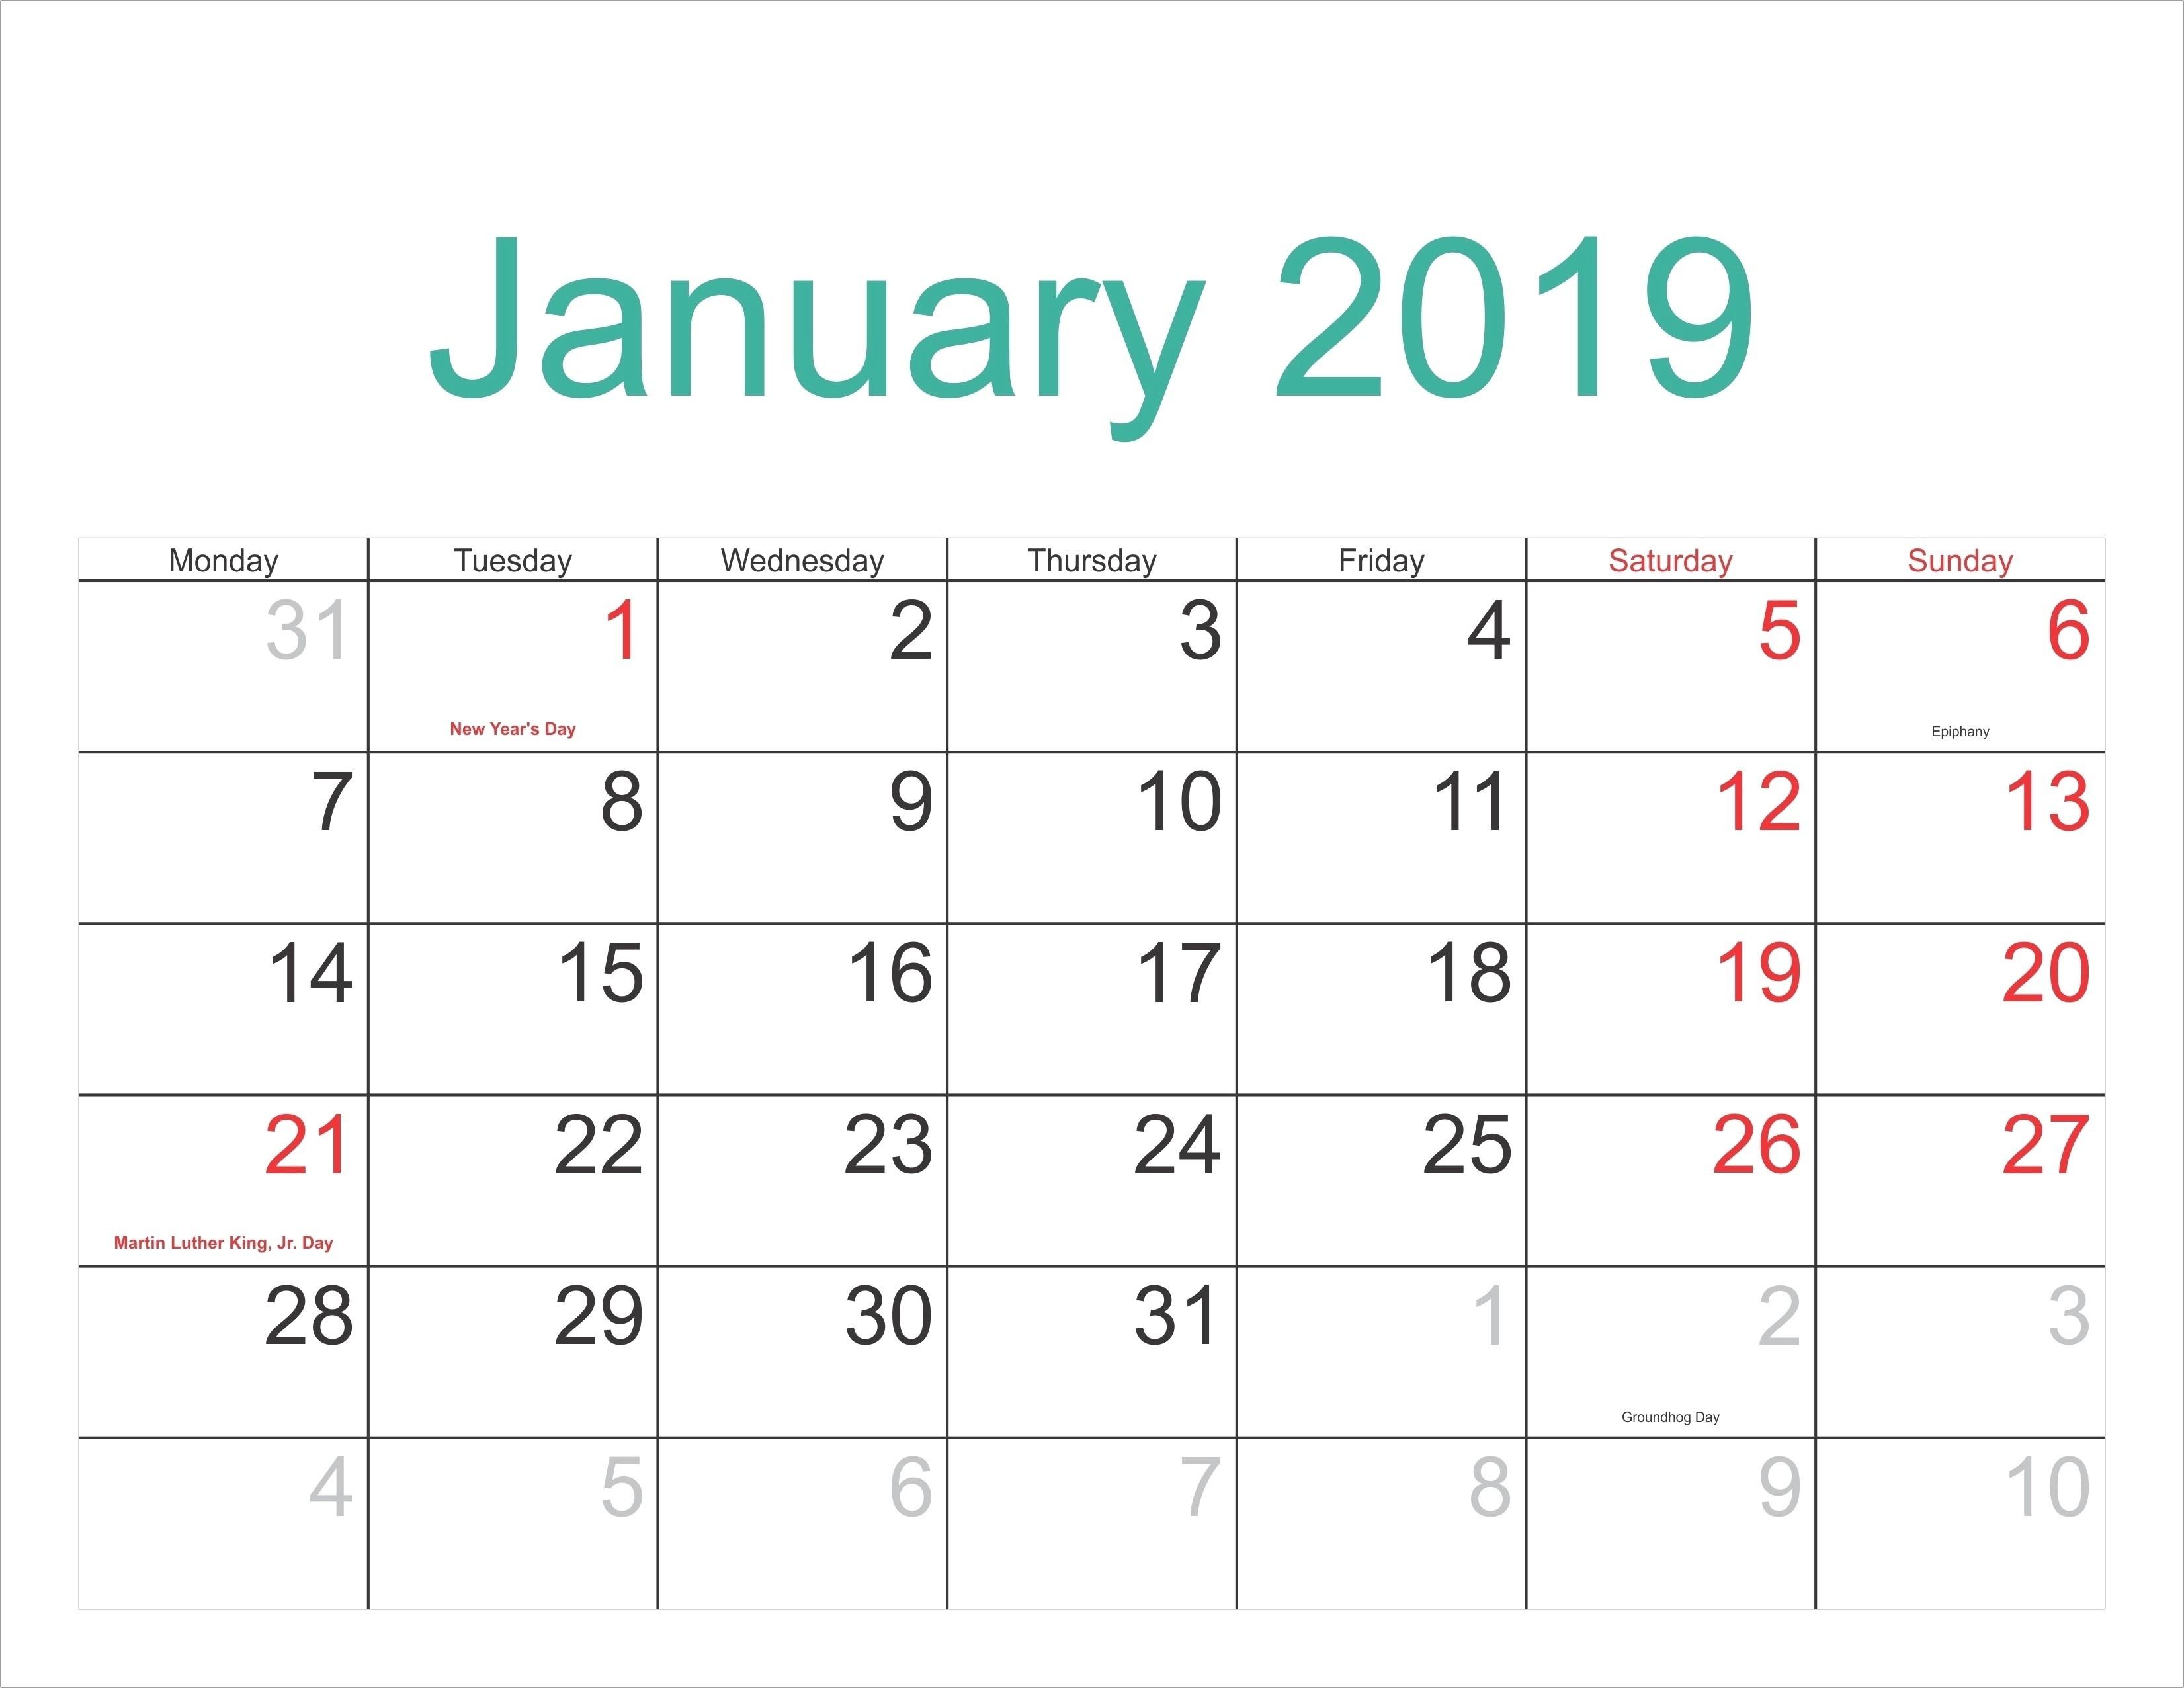 Hindu Calendar 2019 | Jcreview-January 2020 Tithi Calendar